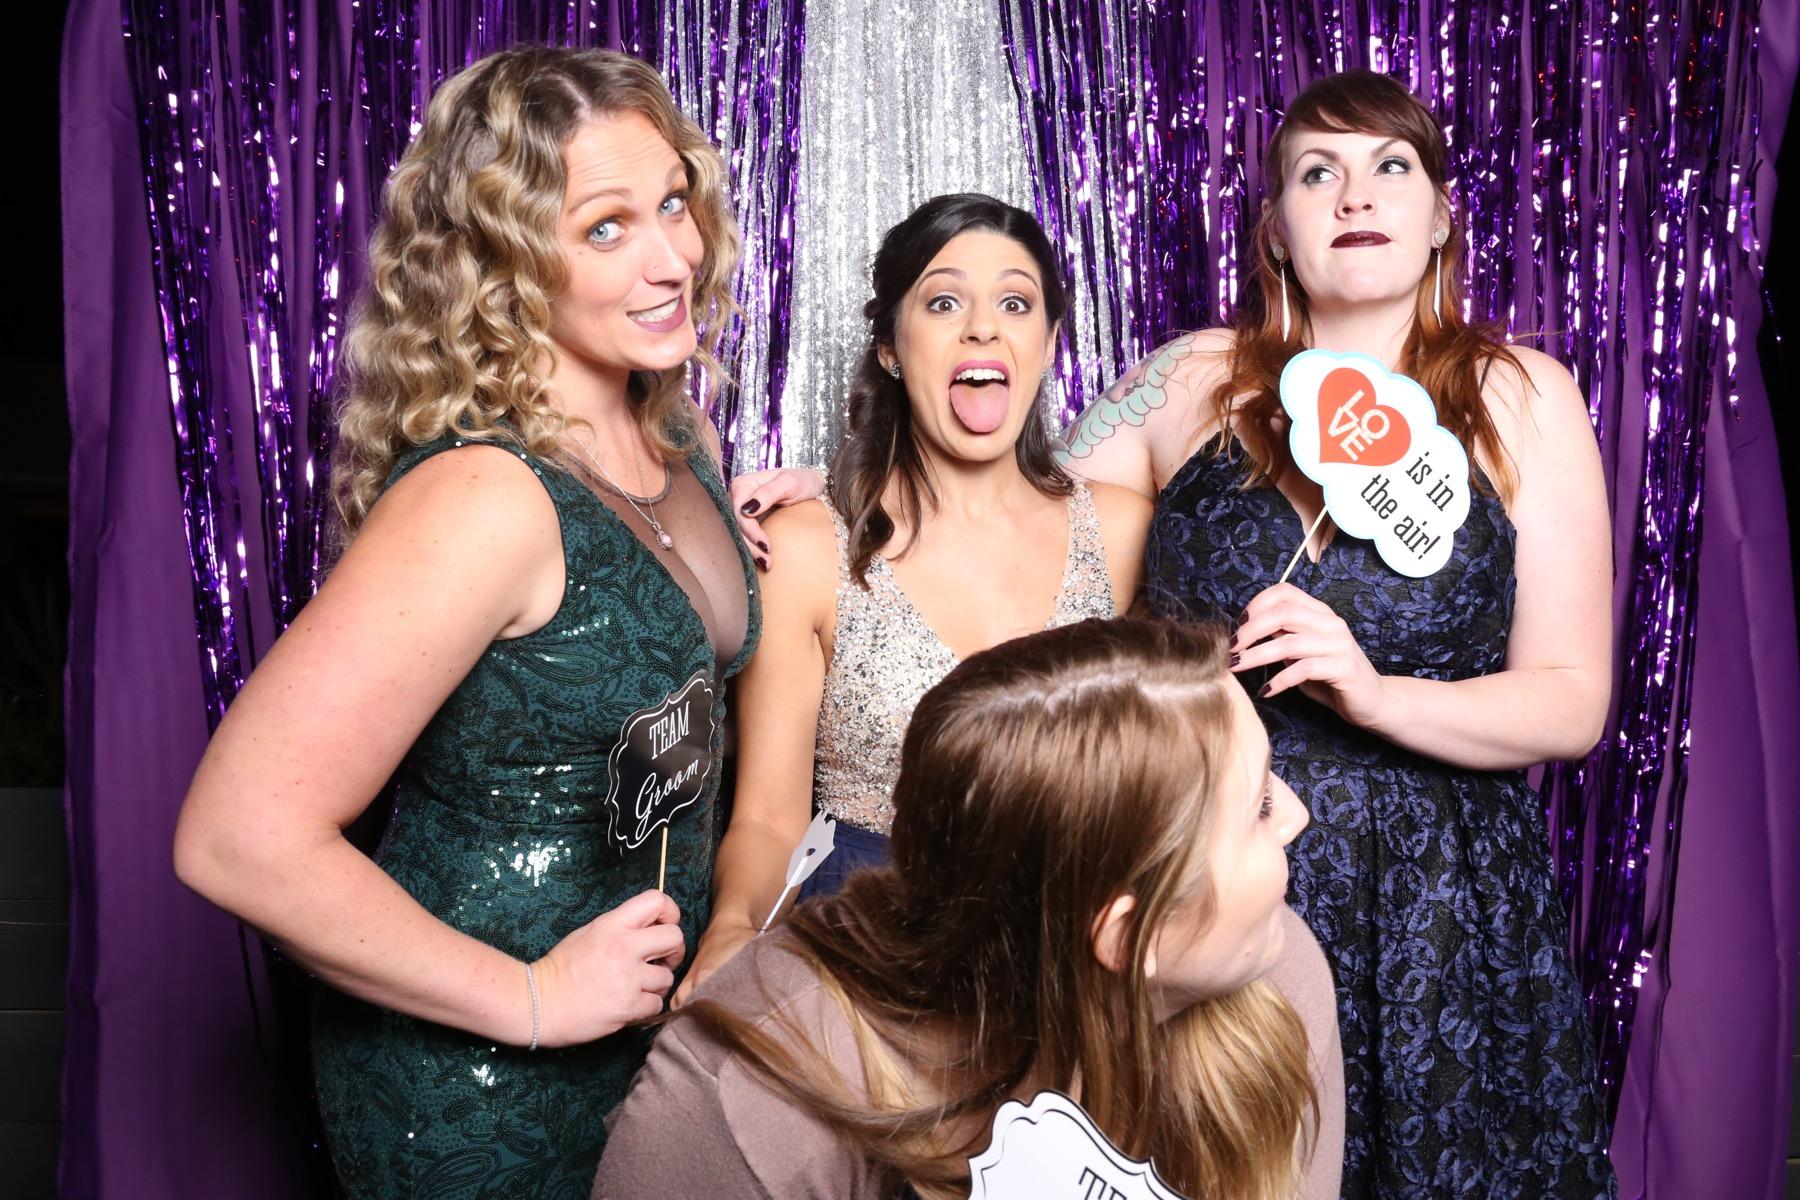 Booth Chamber Photo Booth Harmony Gardens wedding antoine Hart de leon springs photography_47.jpeg